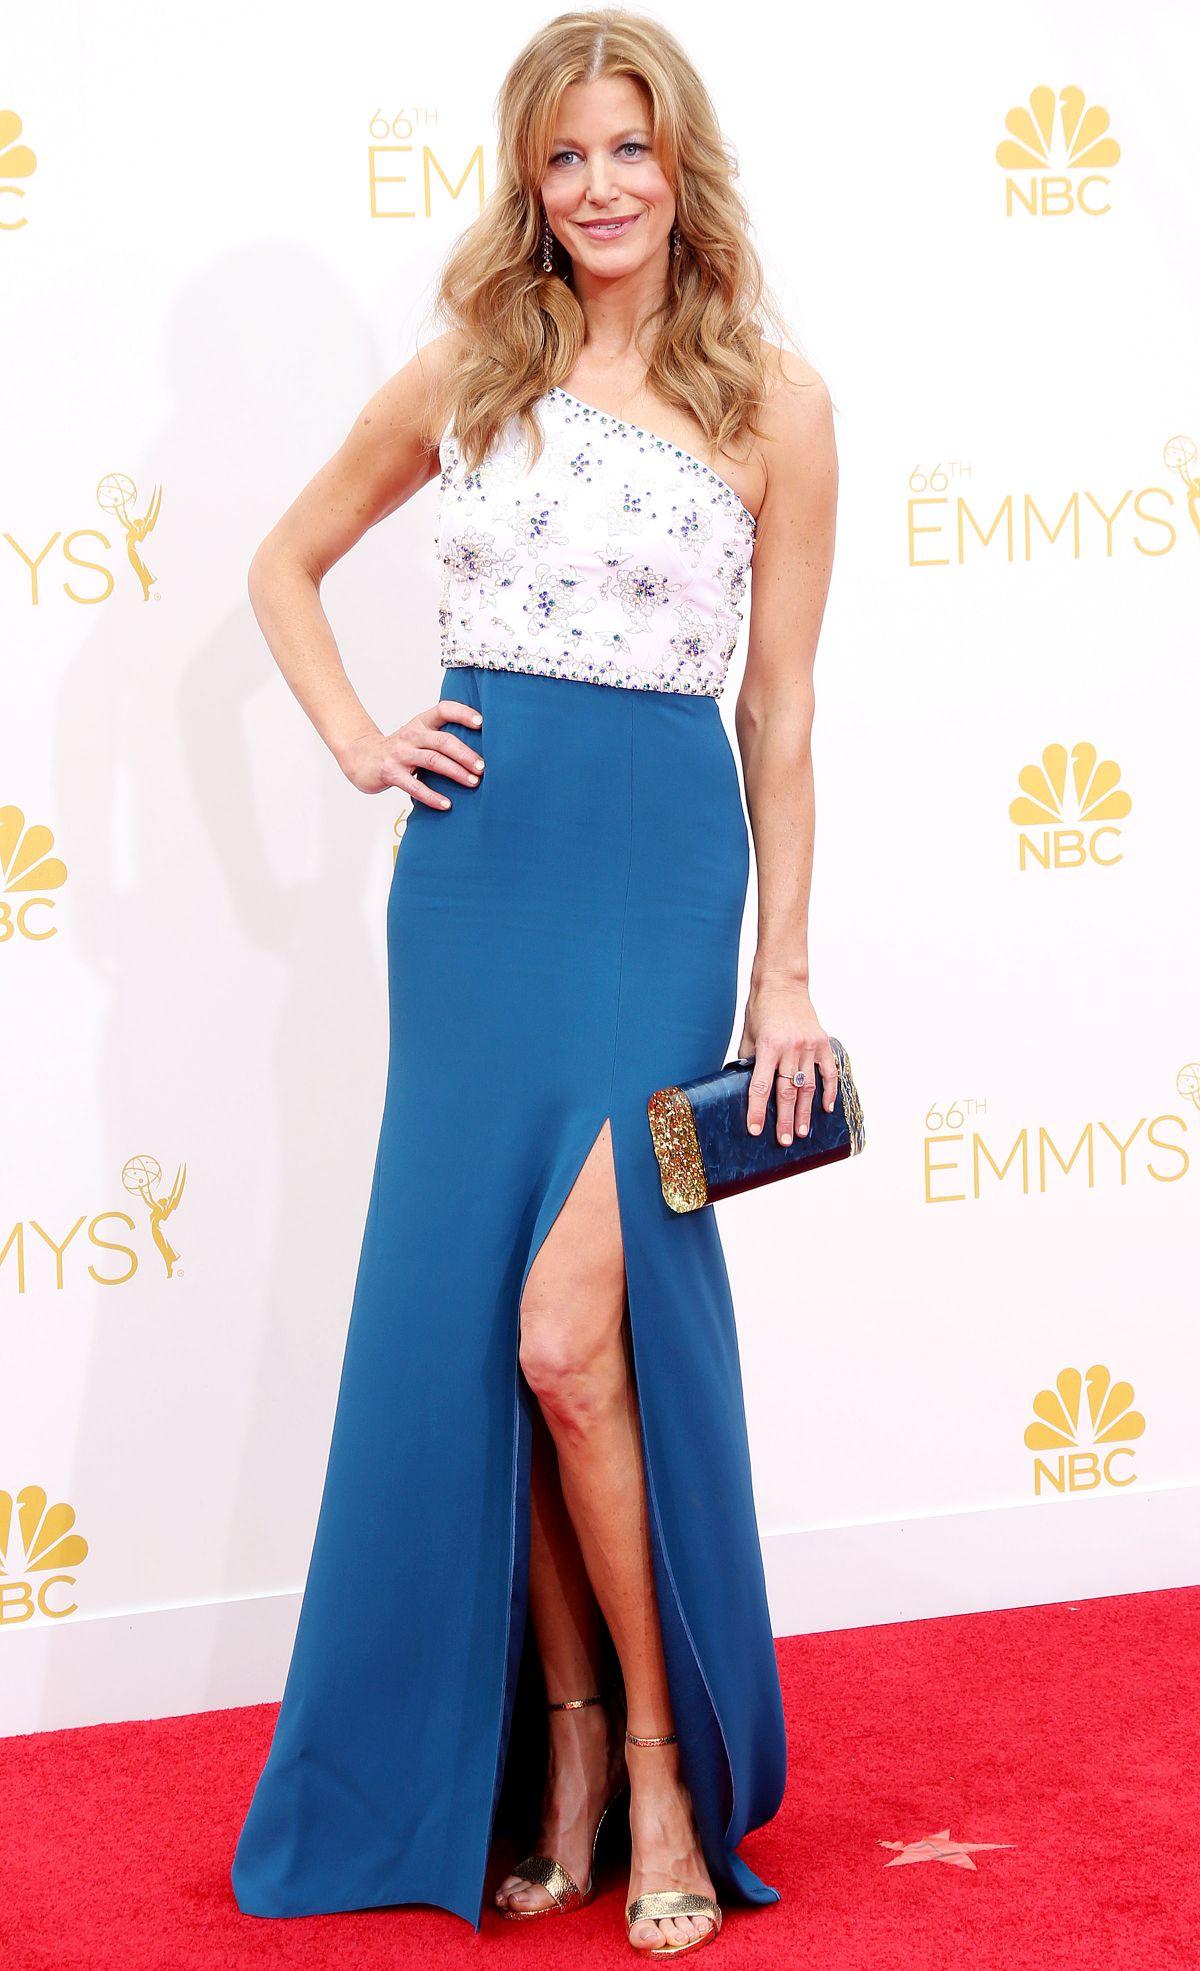 ANNA GUNN at 2014 Emmy Awards